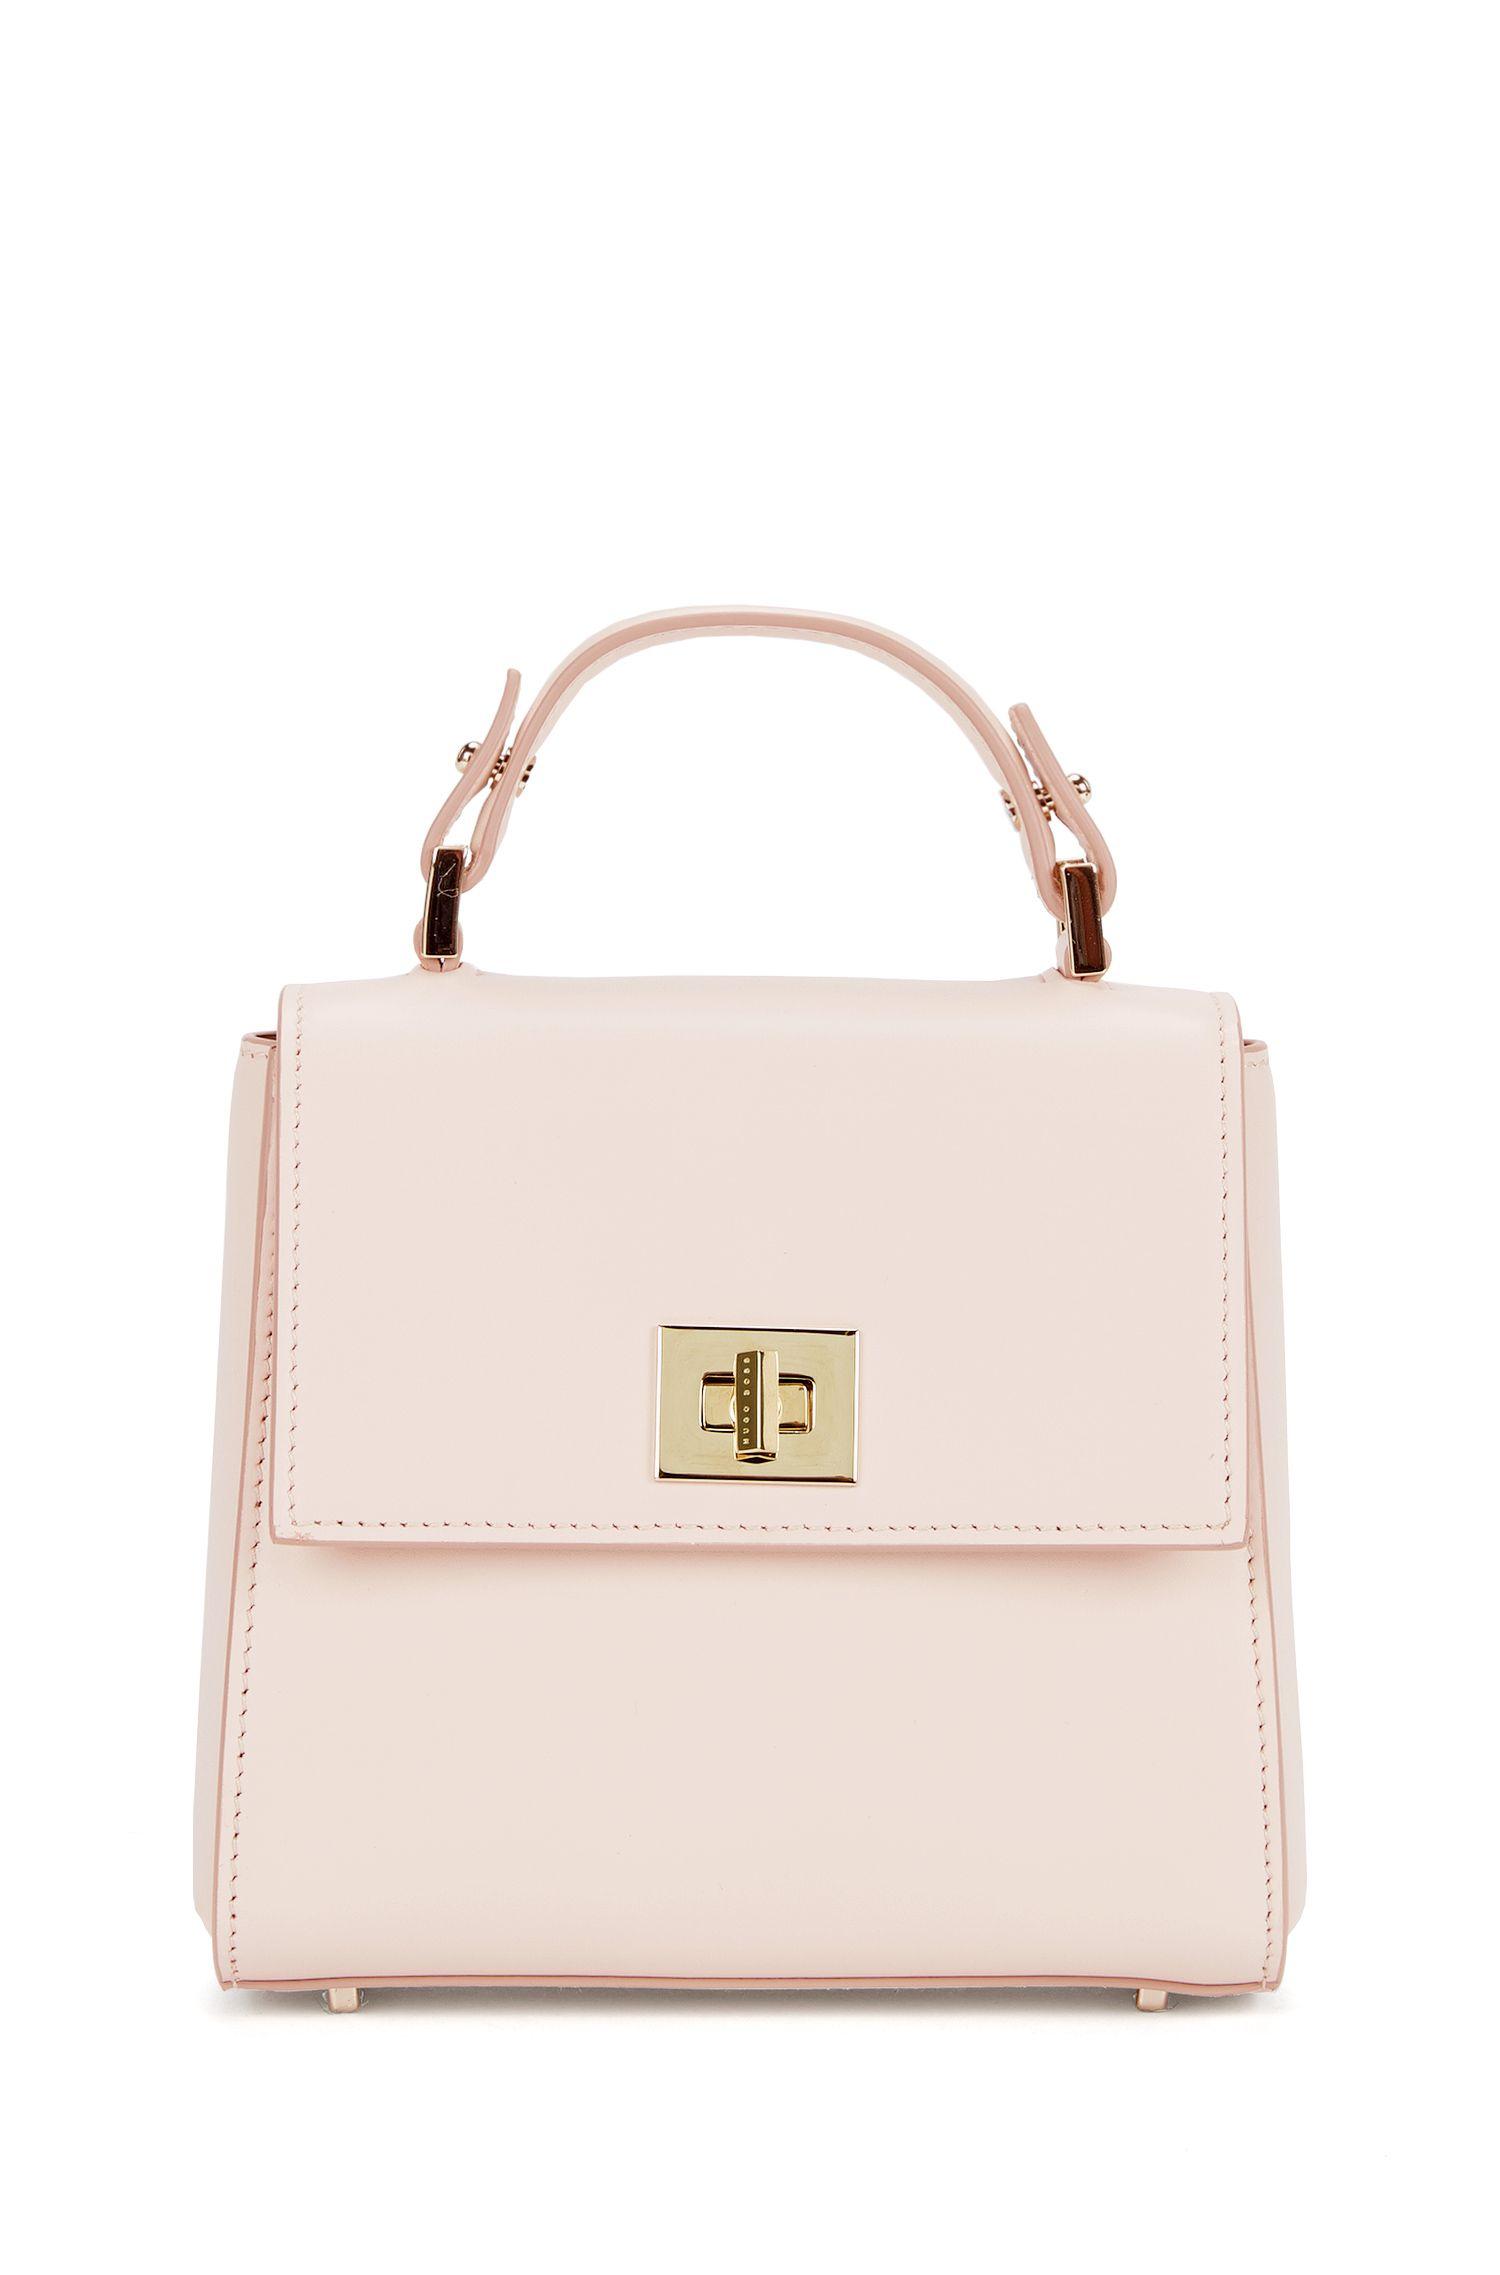 'Bespoke Micro' | Italian Calfskin Bag, Detachable Shoulder Strap